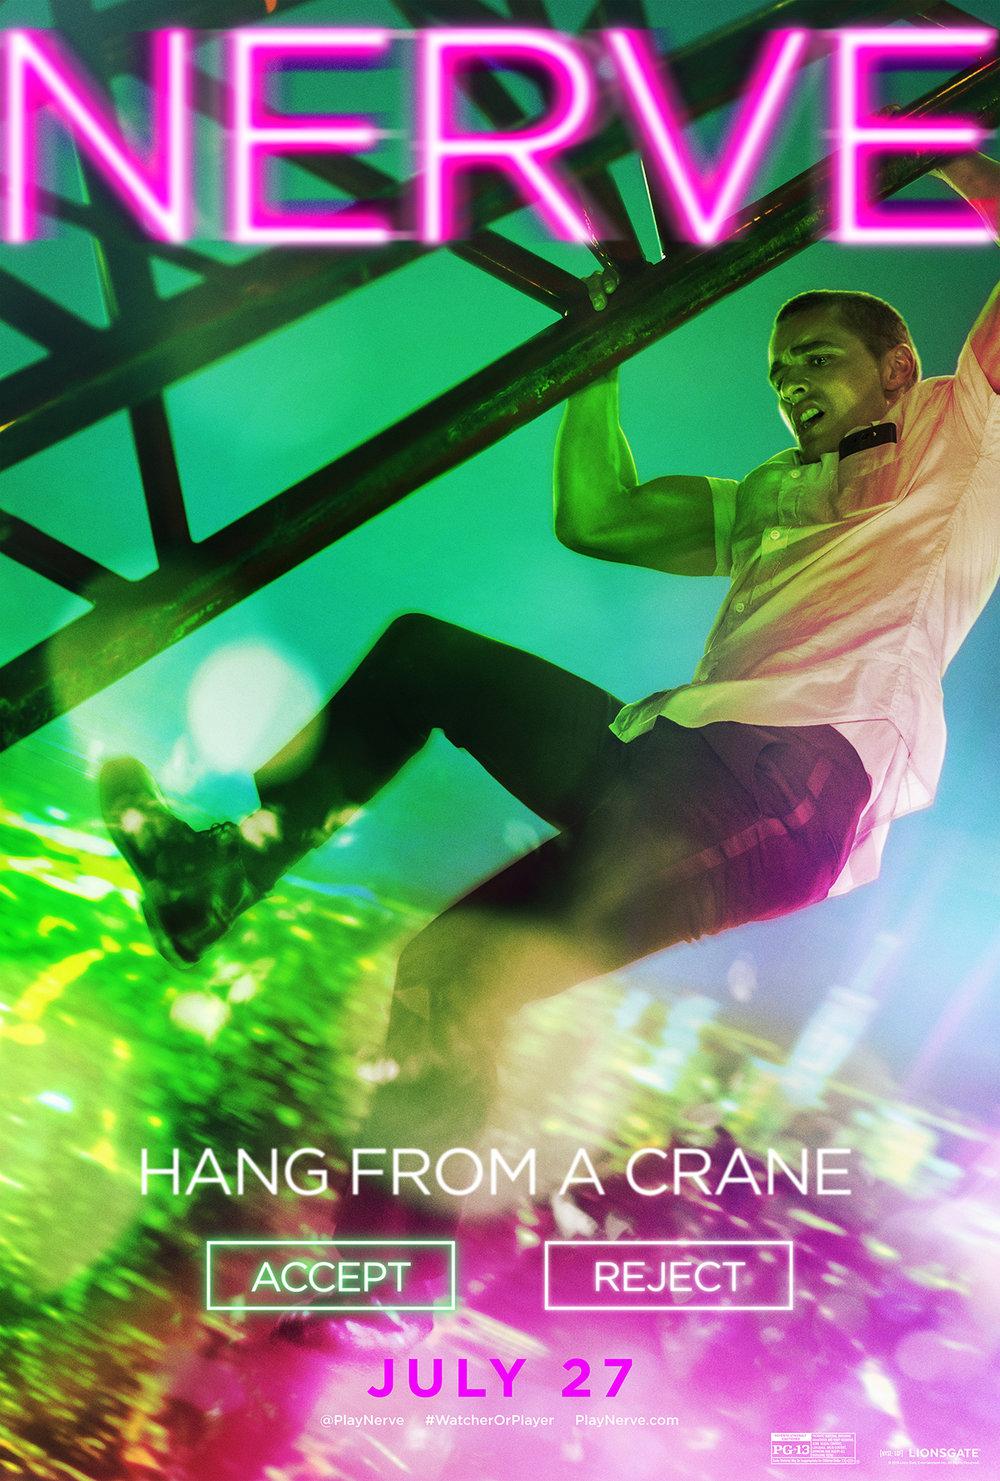 Nerve_Online_1Sht_Crane_100dpi.jpg